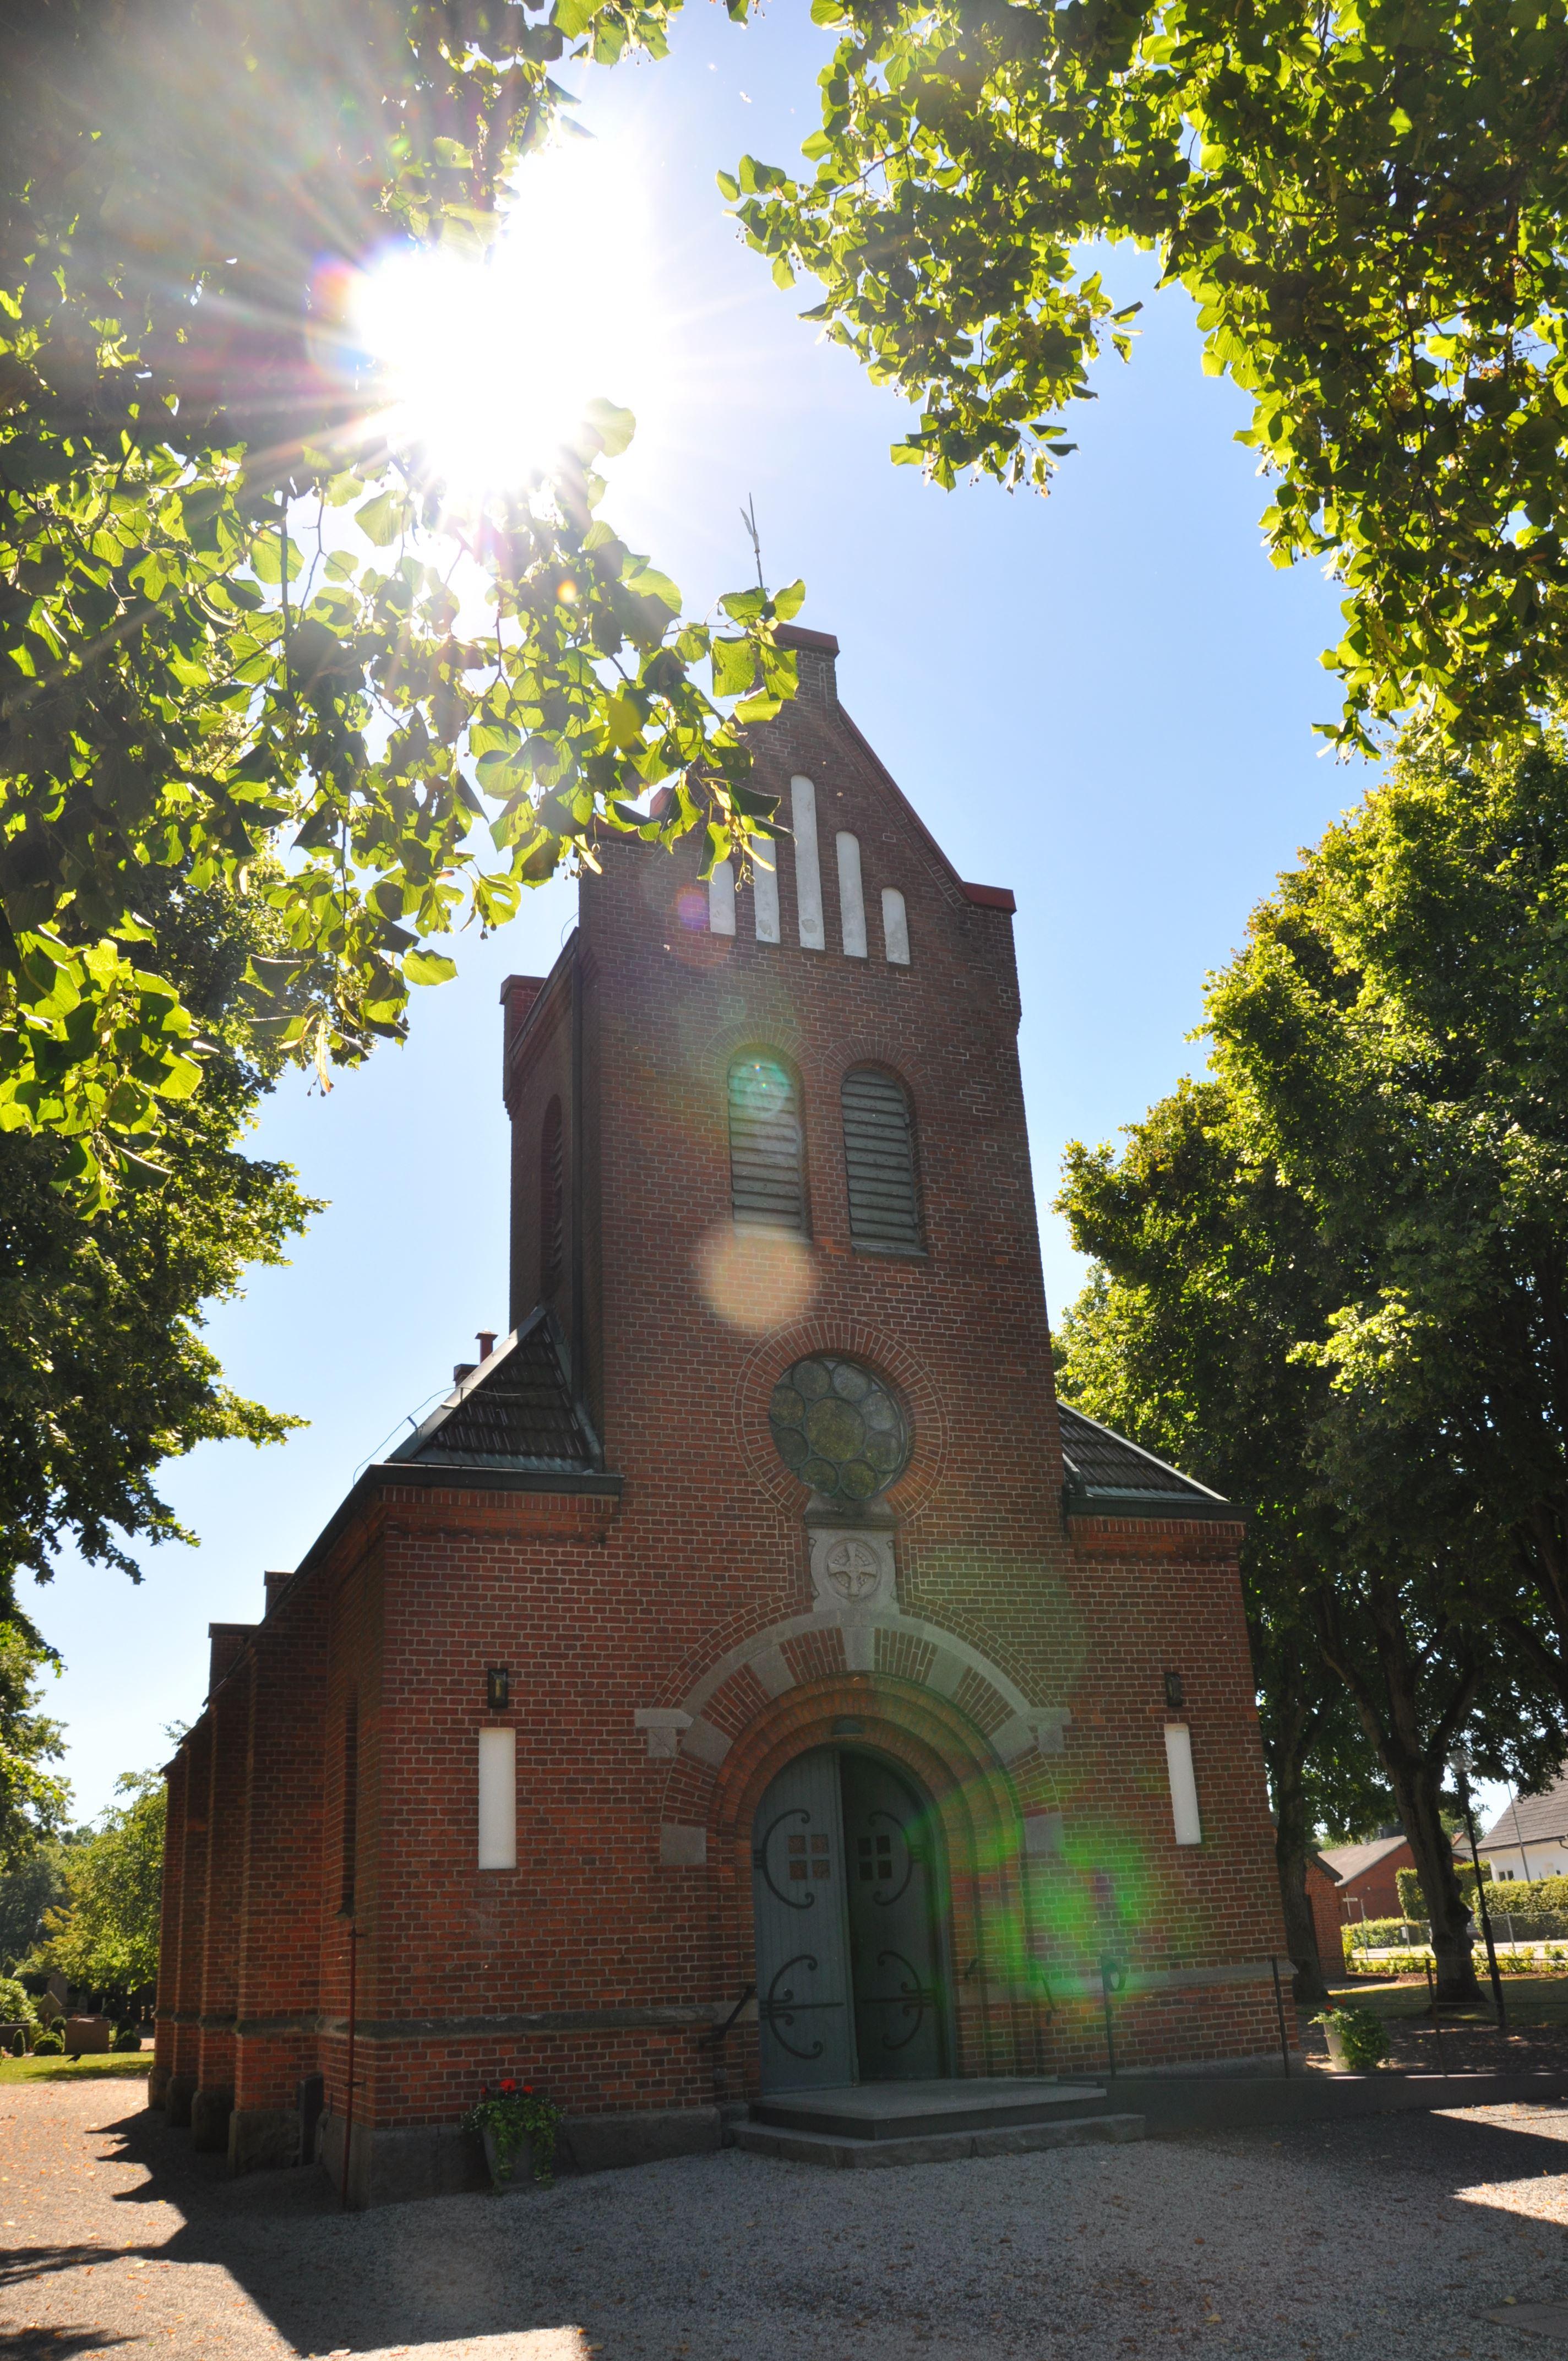 Foto: Elin Andersson, Tomelilla kyrka